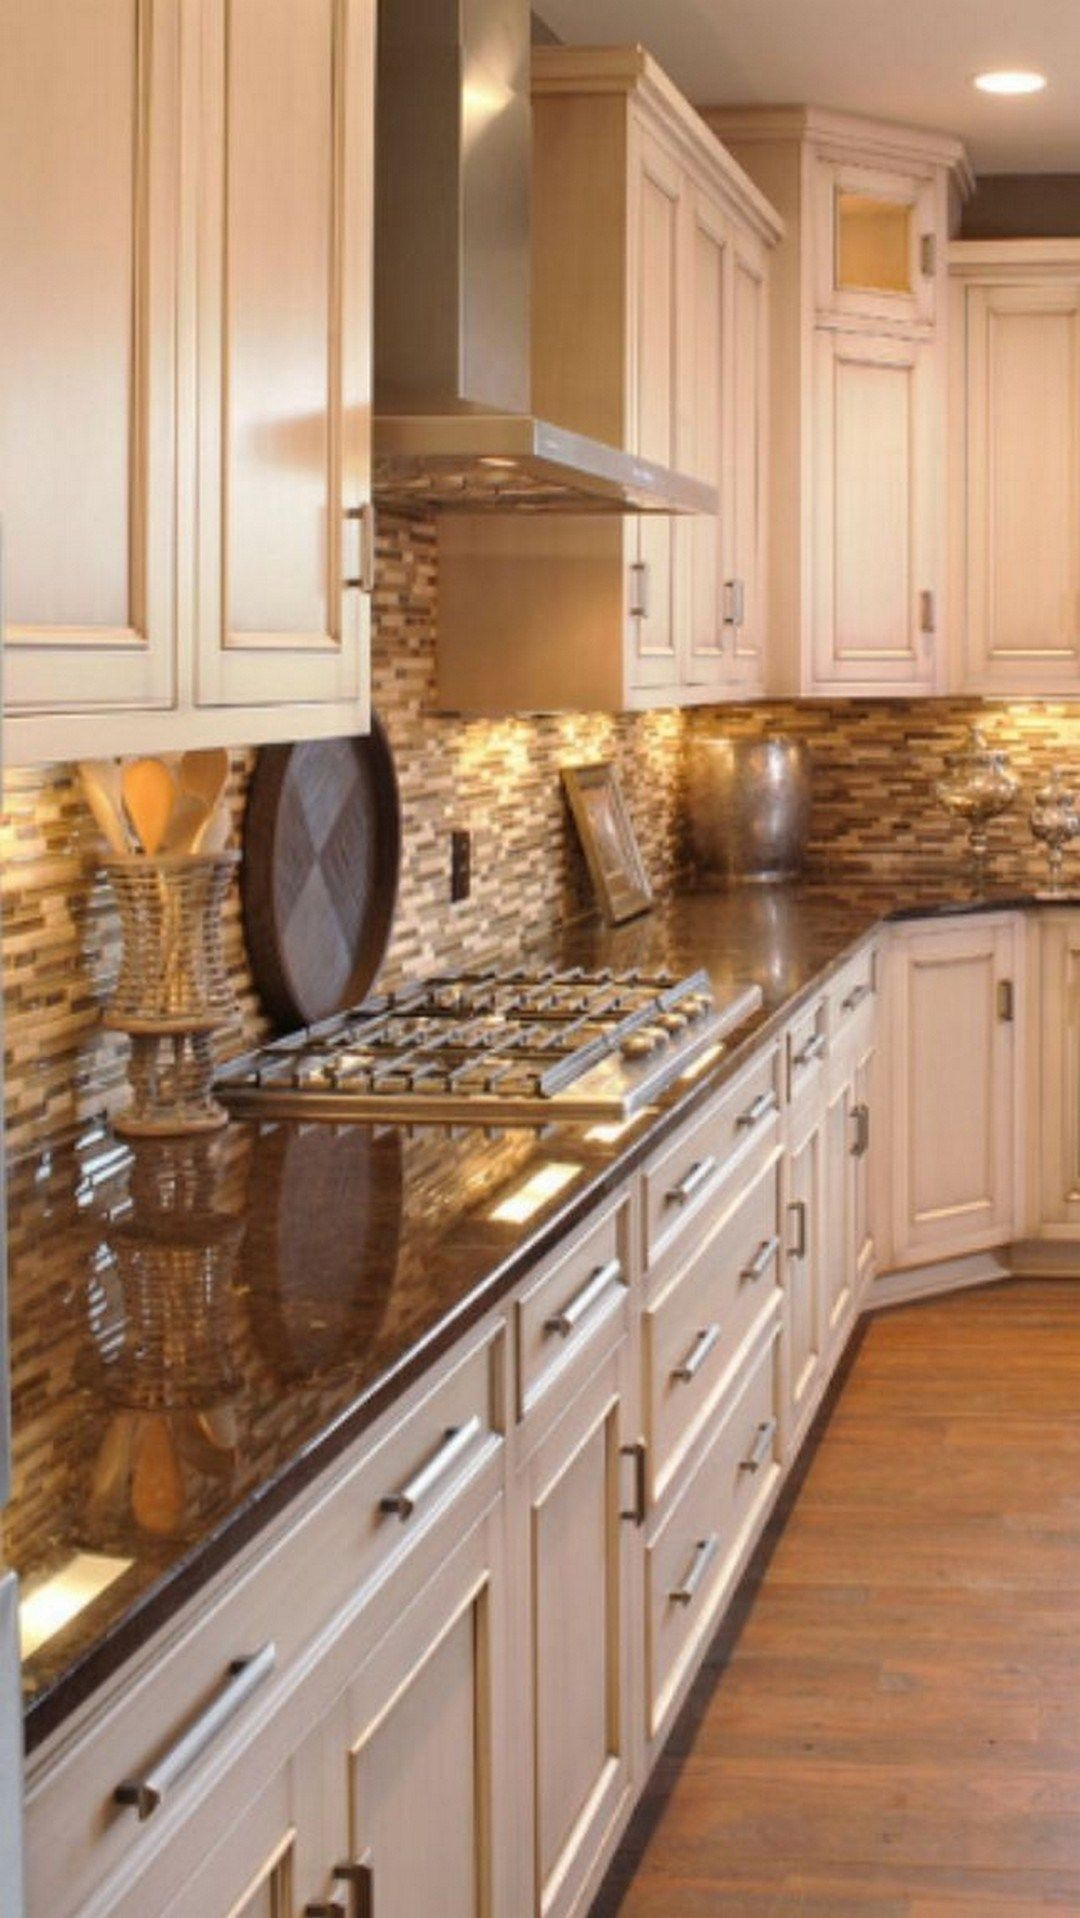 Luxury And Elegant Kitchen Design Inspiration (17 ...